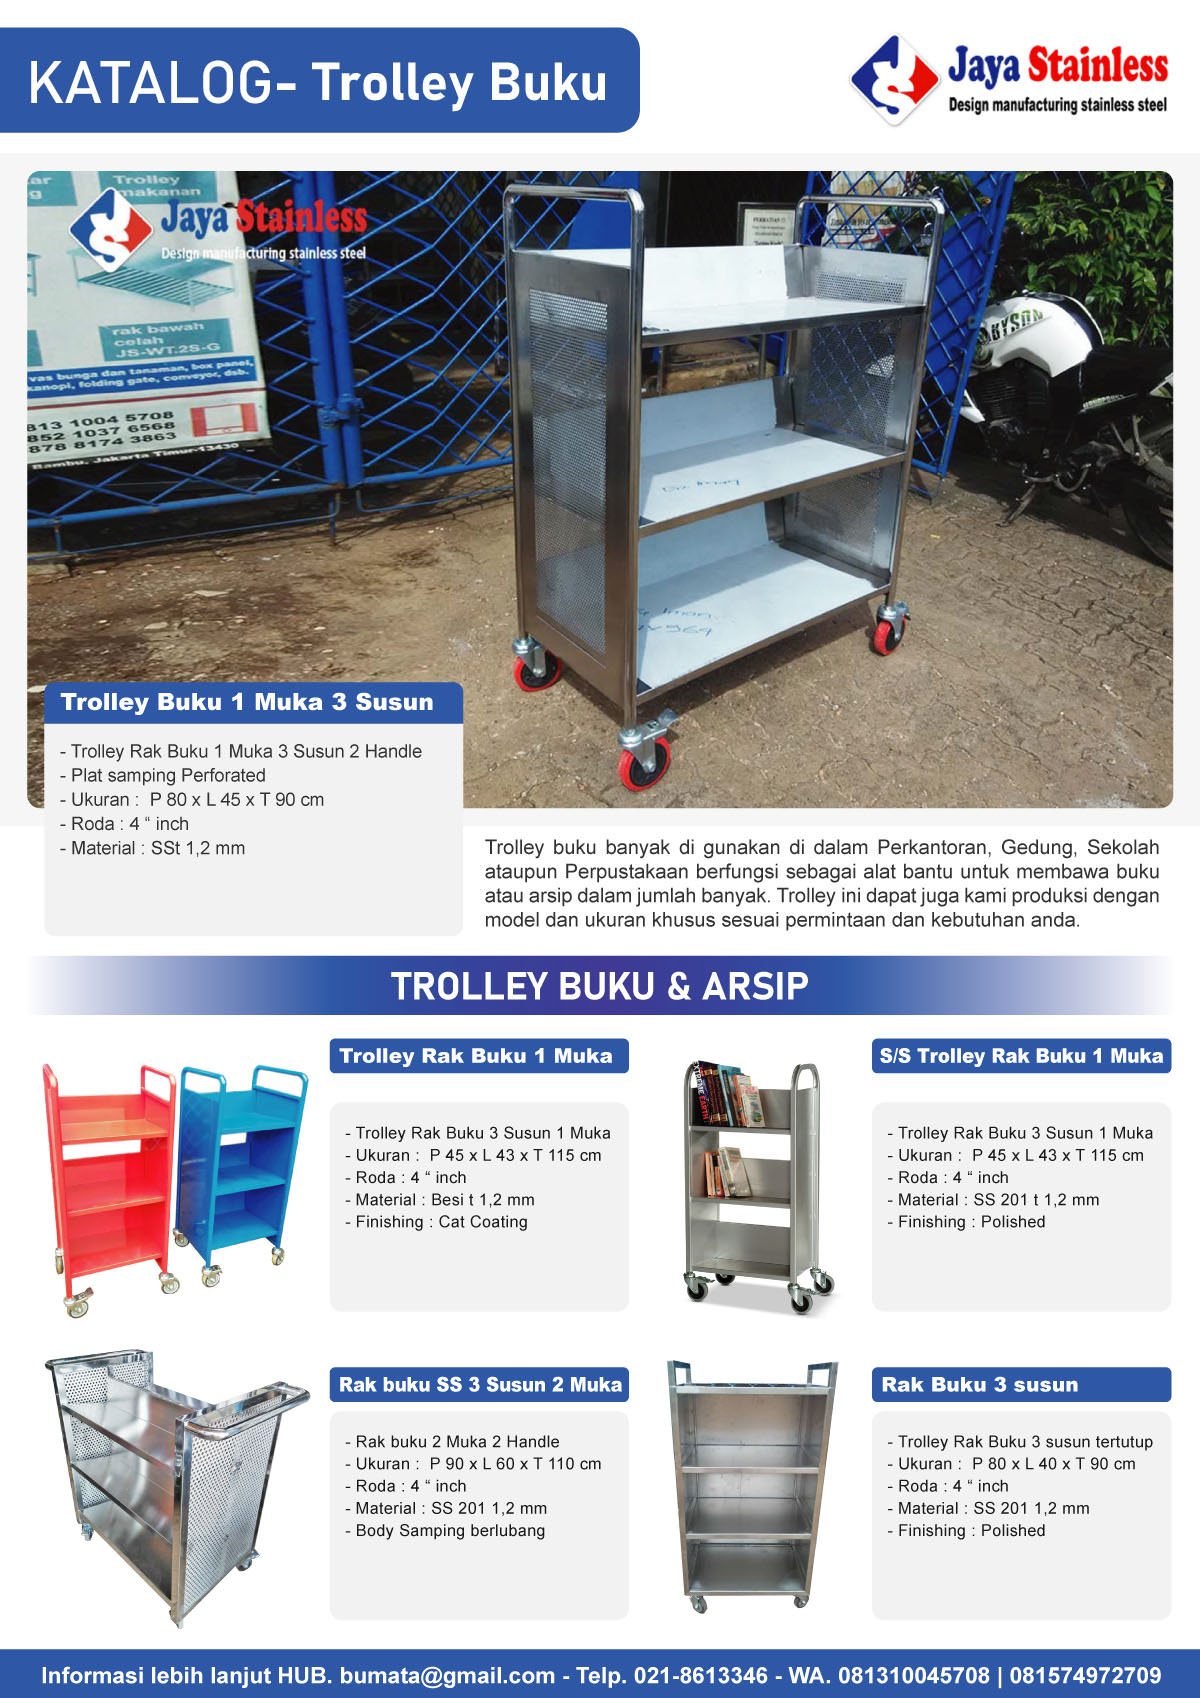 Katalog Trolley Buku dan Arsip JAYASTAINLESS